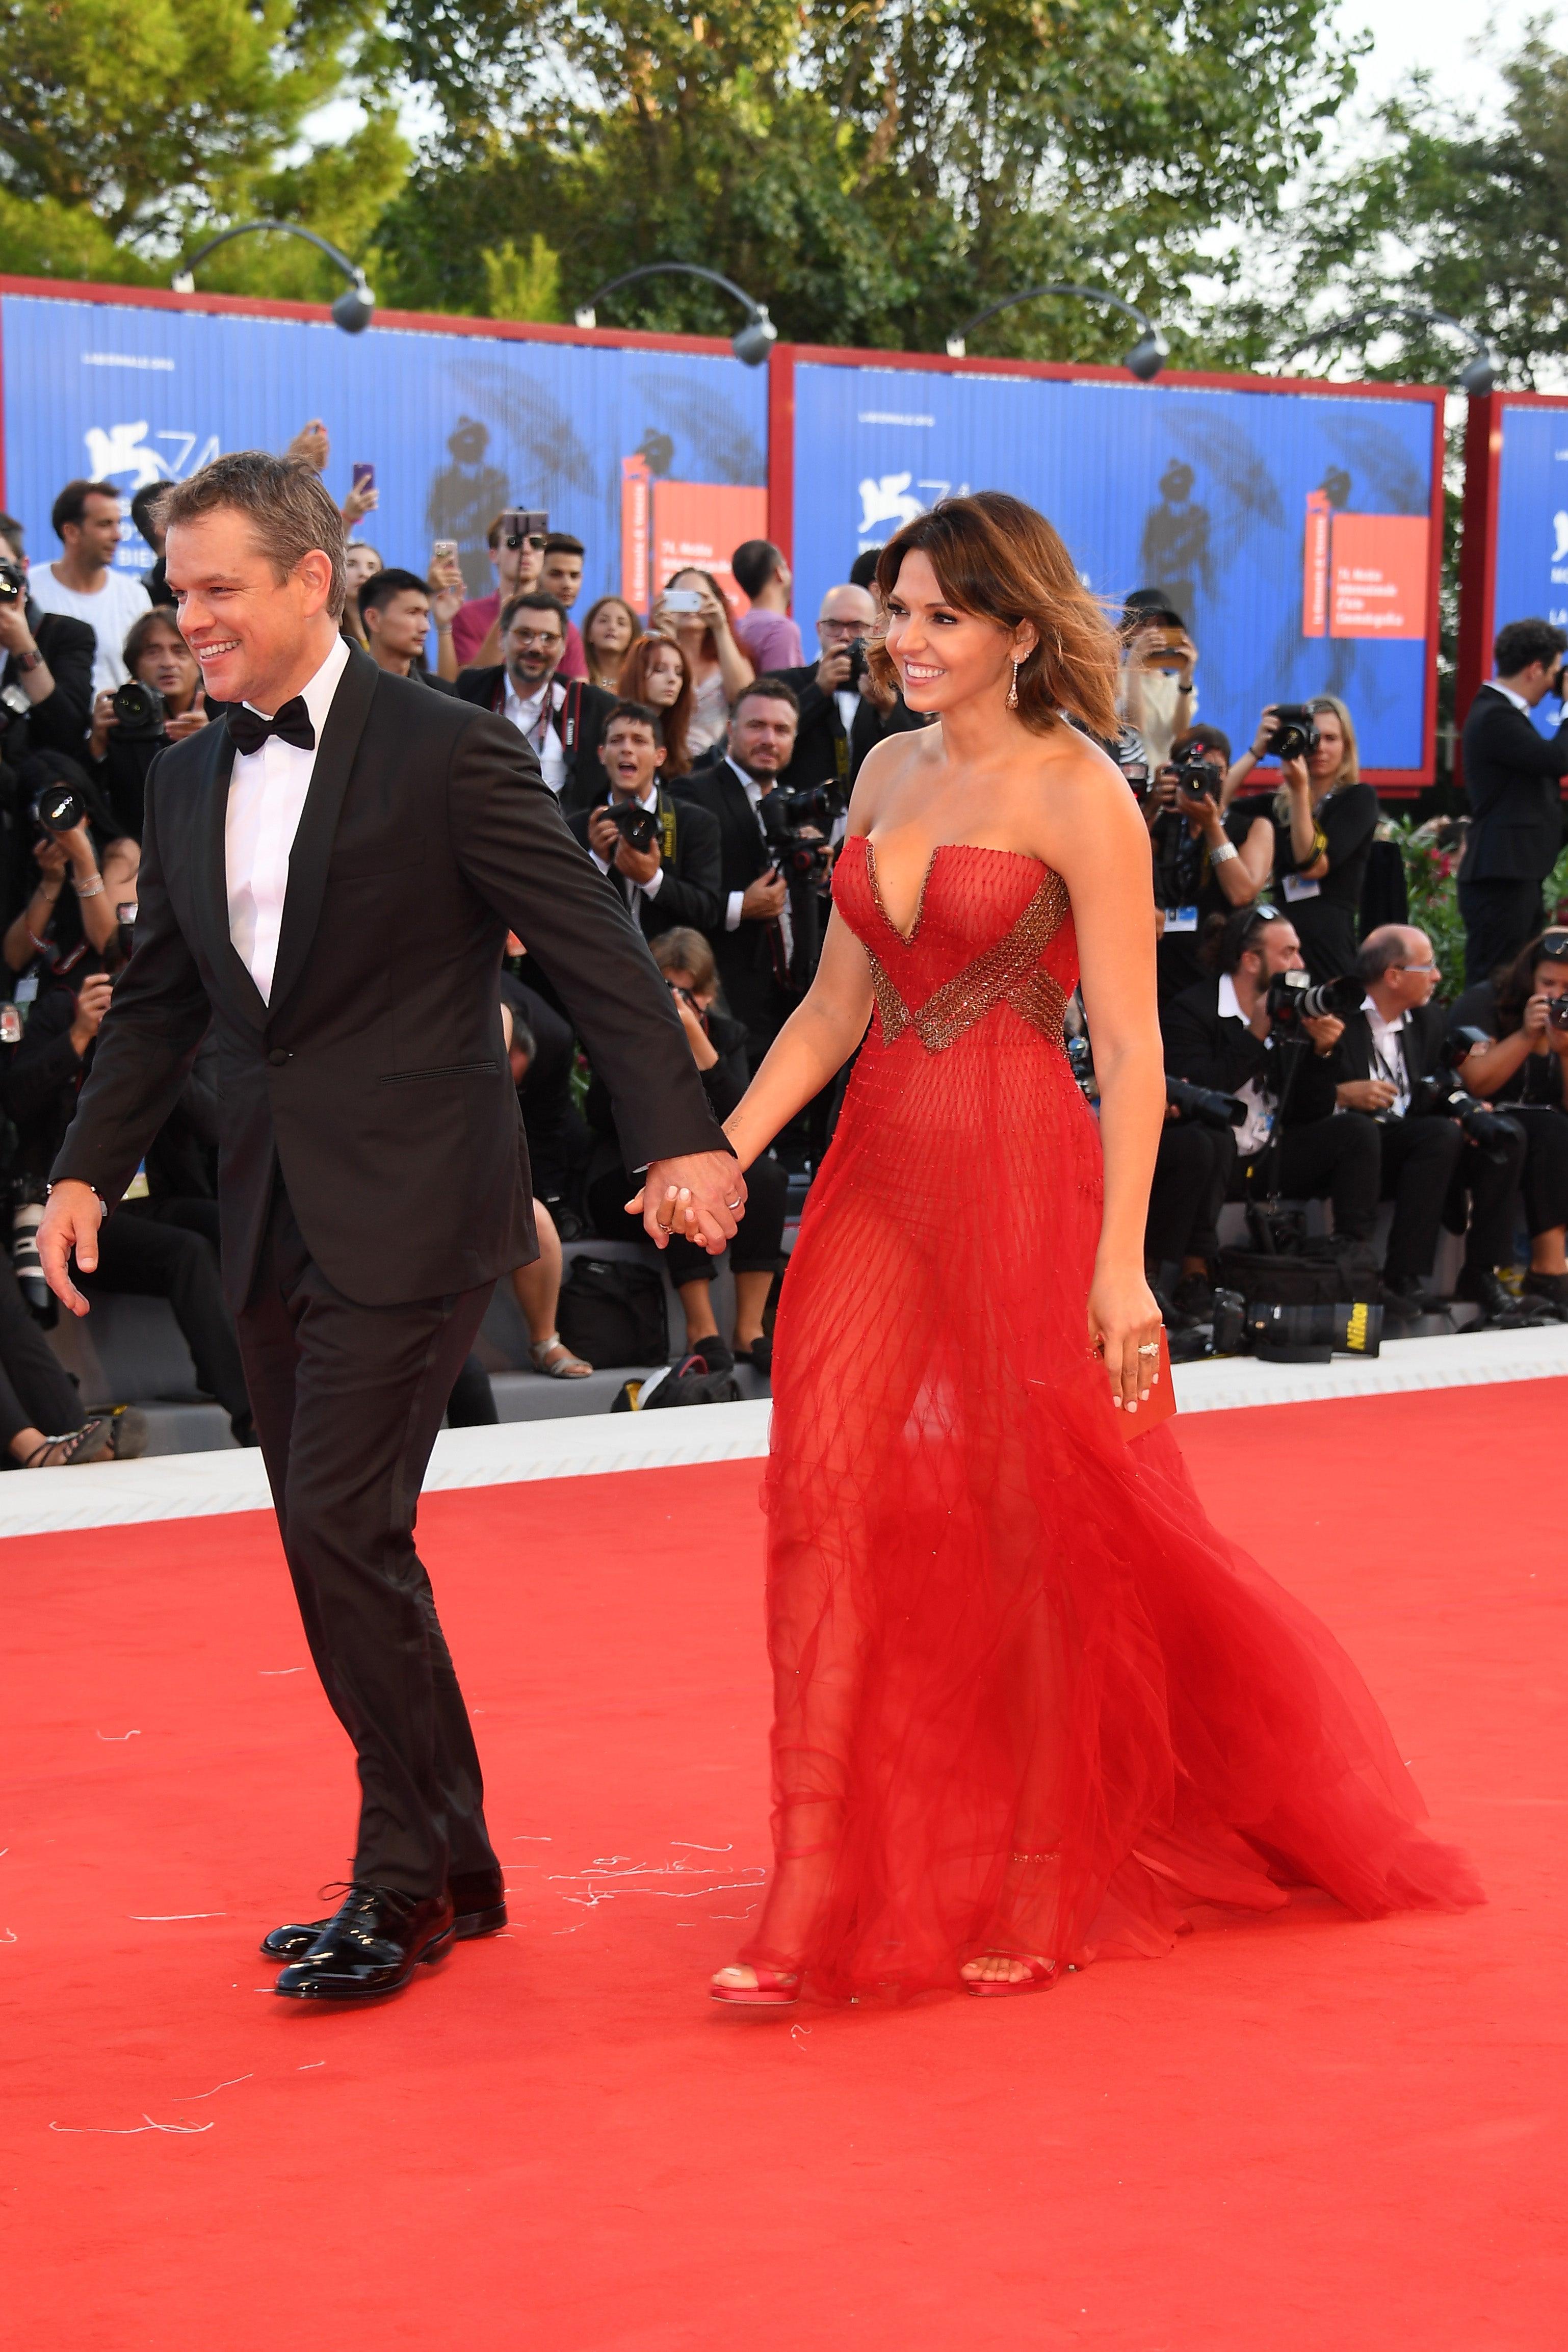 Matt Damon and Wife Luciana Barroso Look So in Love at ... Matt Damon Wife